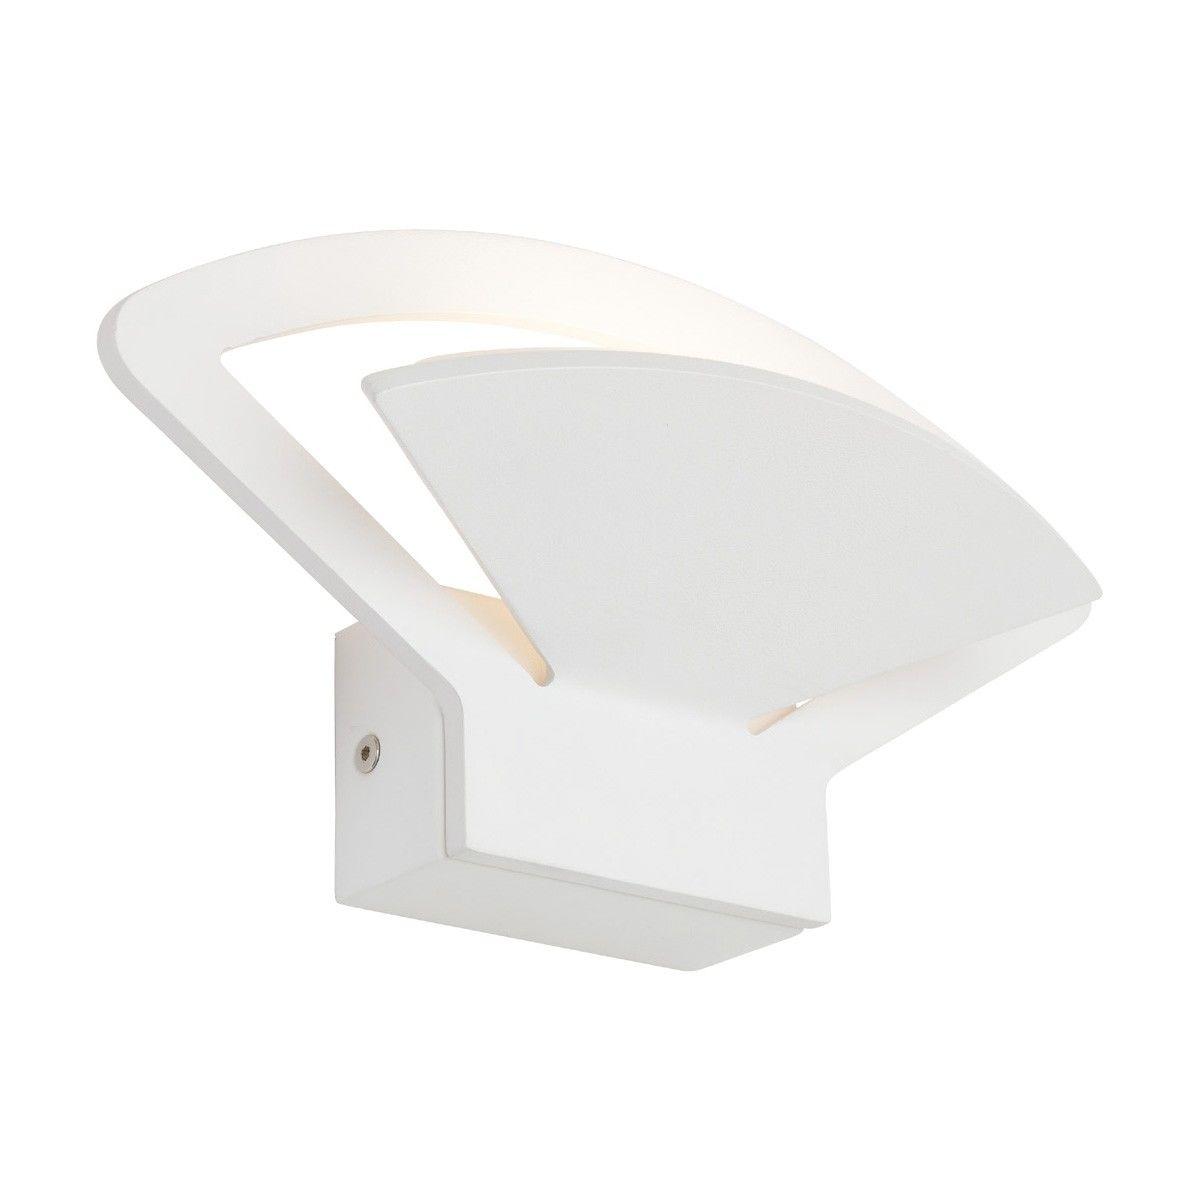 Fiesta LED Wall Light, 12W, White